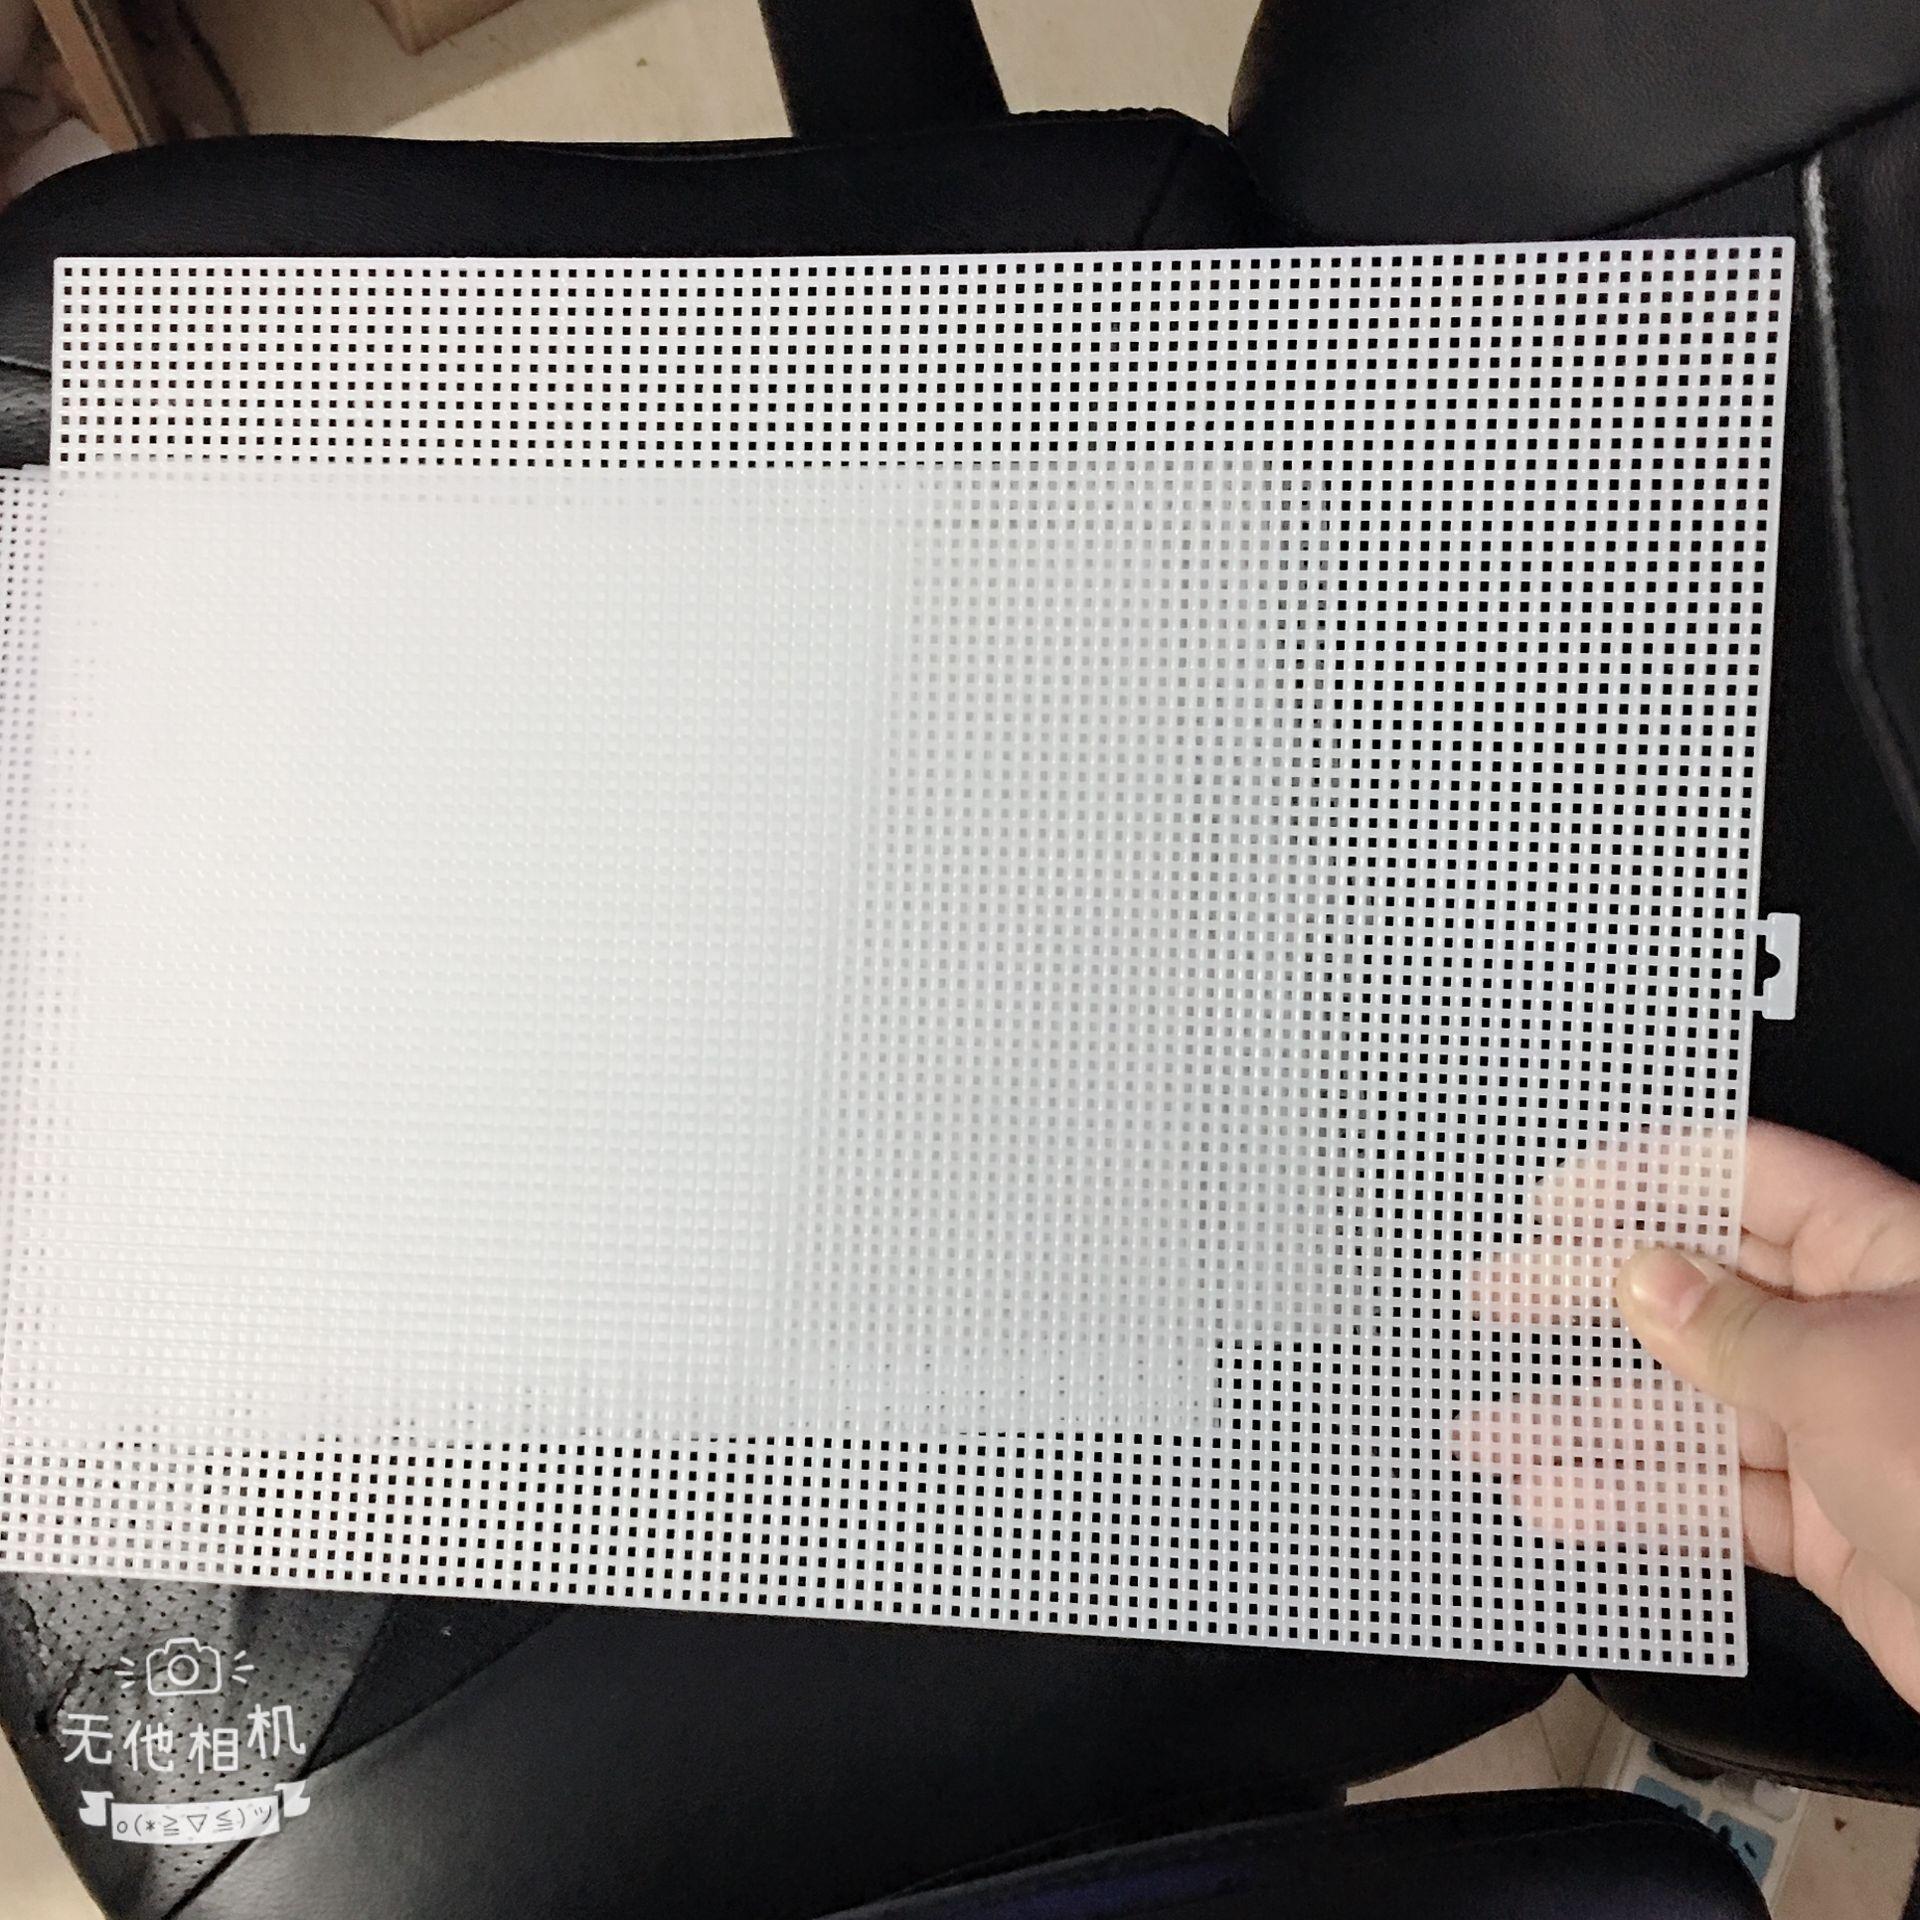 Ткань для вышивки прозрачная гипермаркет ткани